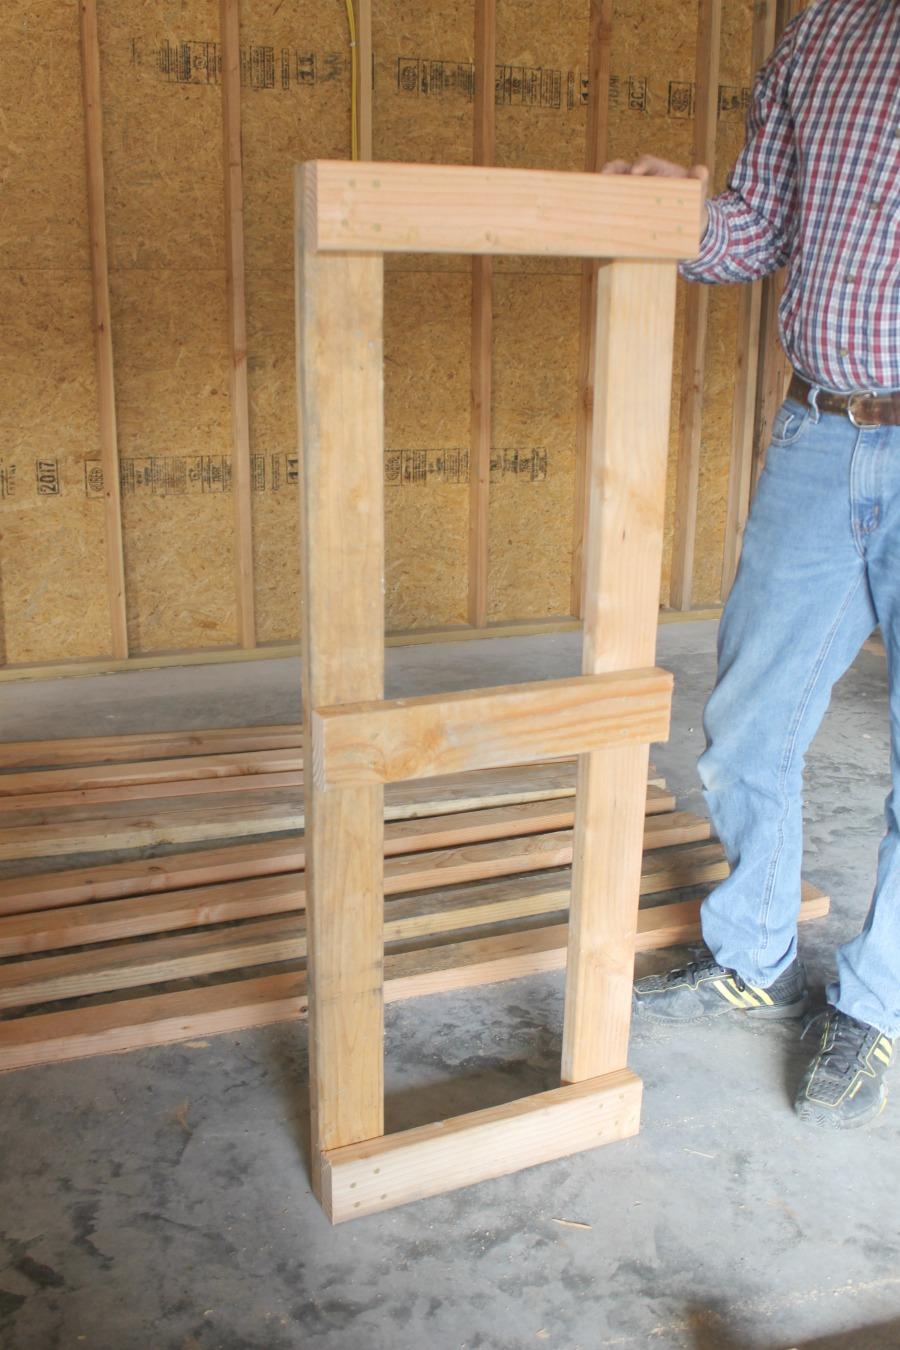 Brilliant How To Build Diy Garage Storage Shelves For Under 60 Download Free Architecture Designs Embacsunscenecom